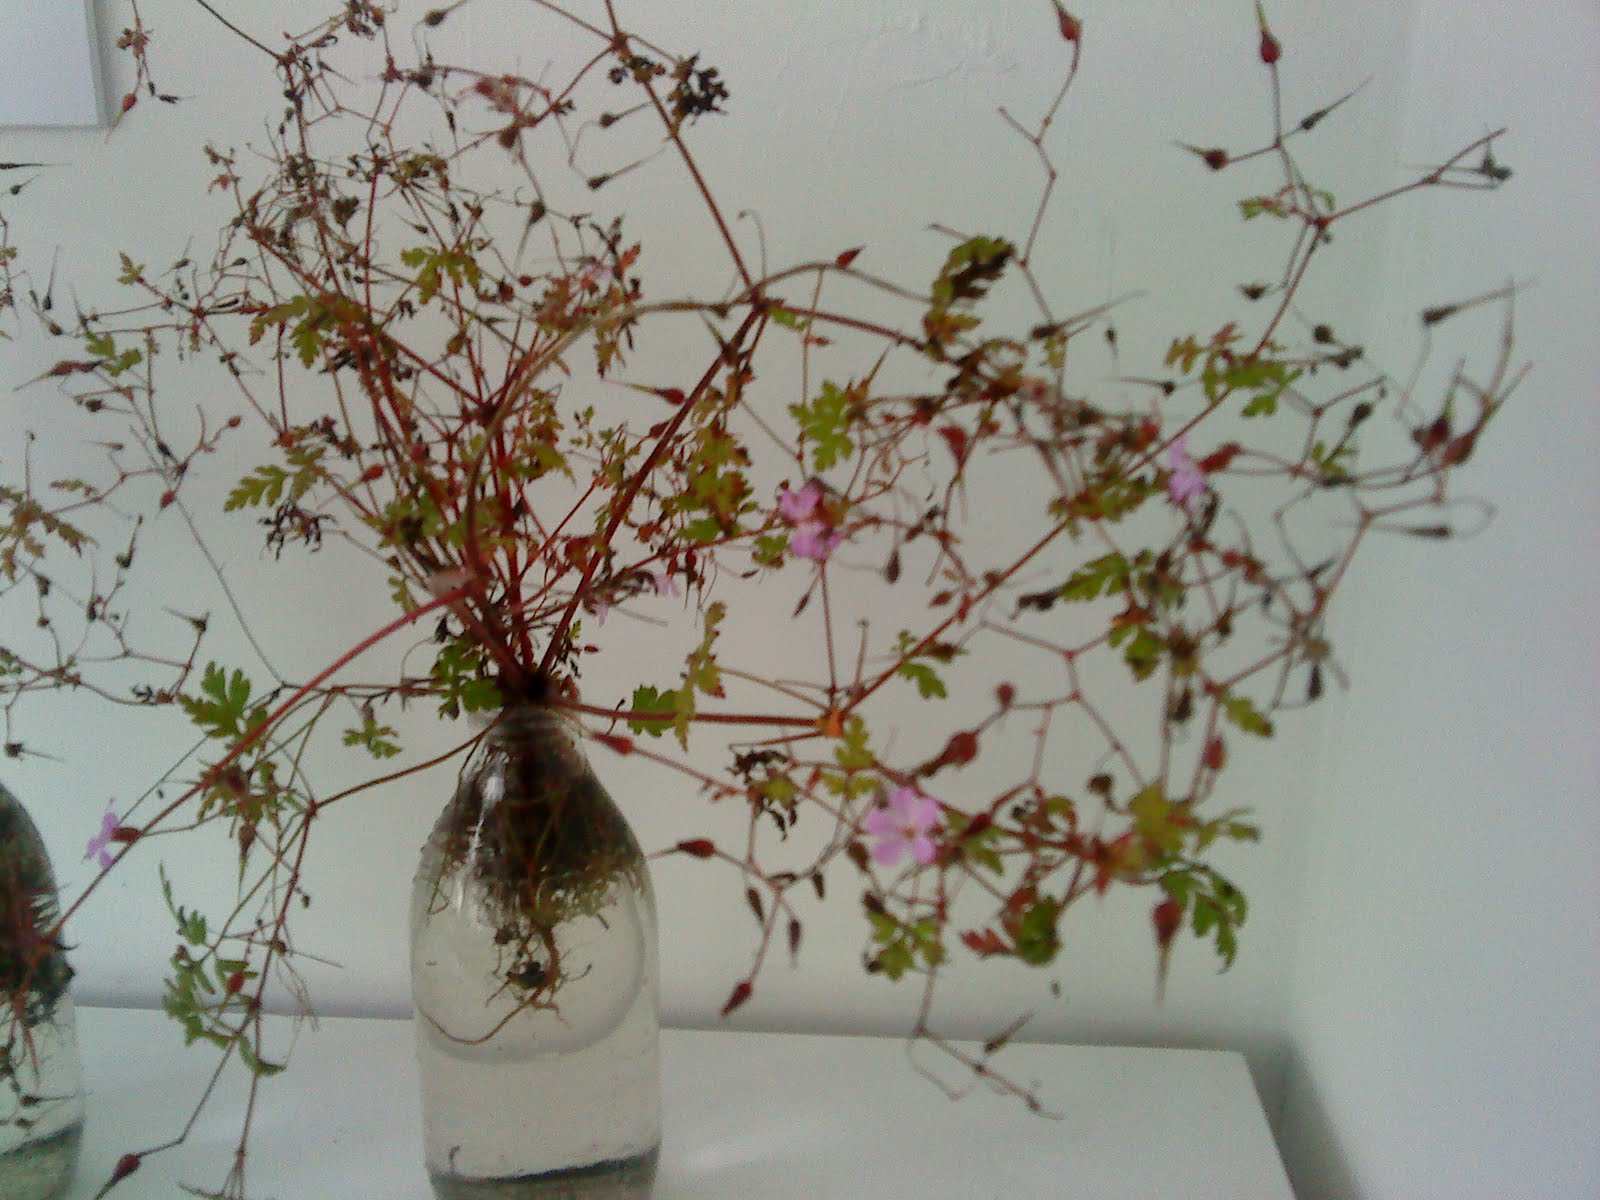 http://4.bp.blogspot.com/_UqJoWahooh0/TJN3S4KfSxI/AAAAAAAAATg/8gFndLkGwds/s1600/pink+flower+red+stem.JPG